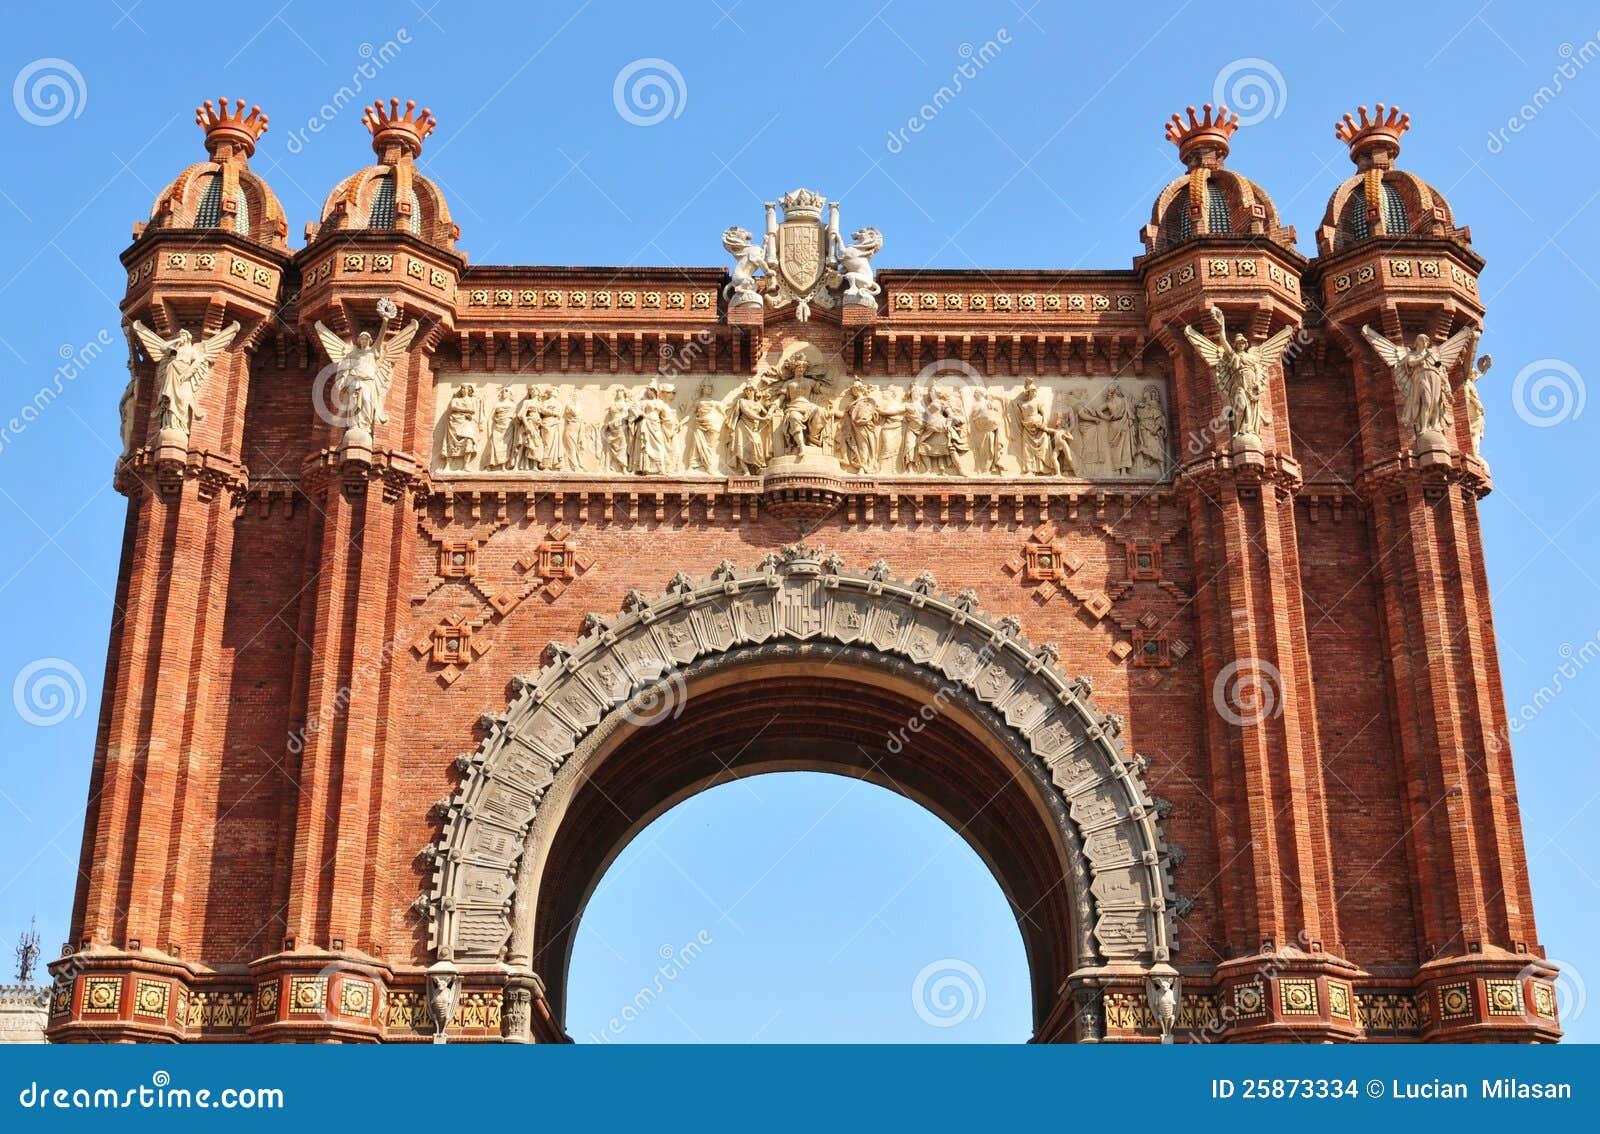 Spanish Architecture Stock Images - Image: 25873334